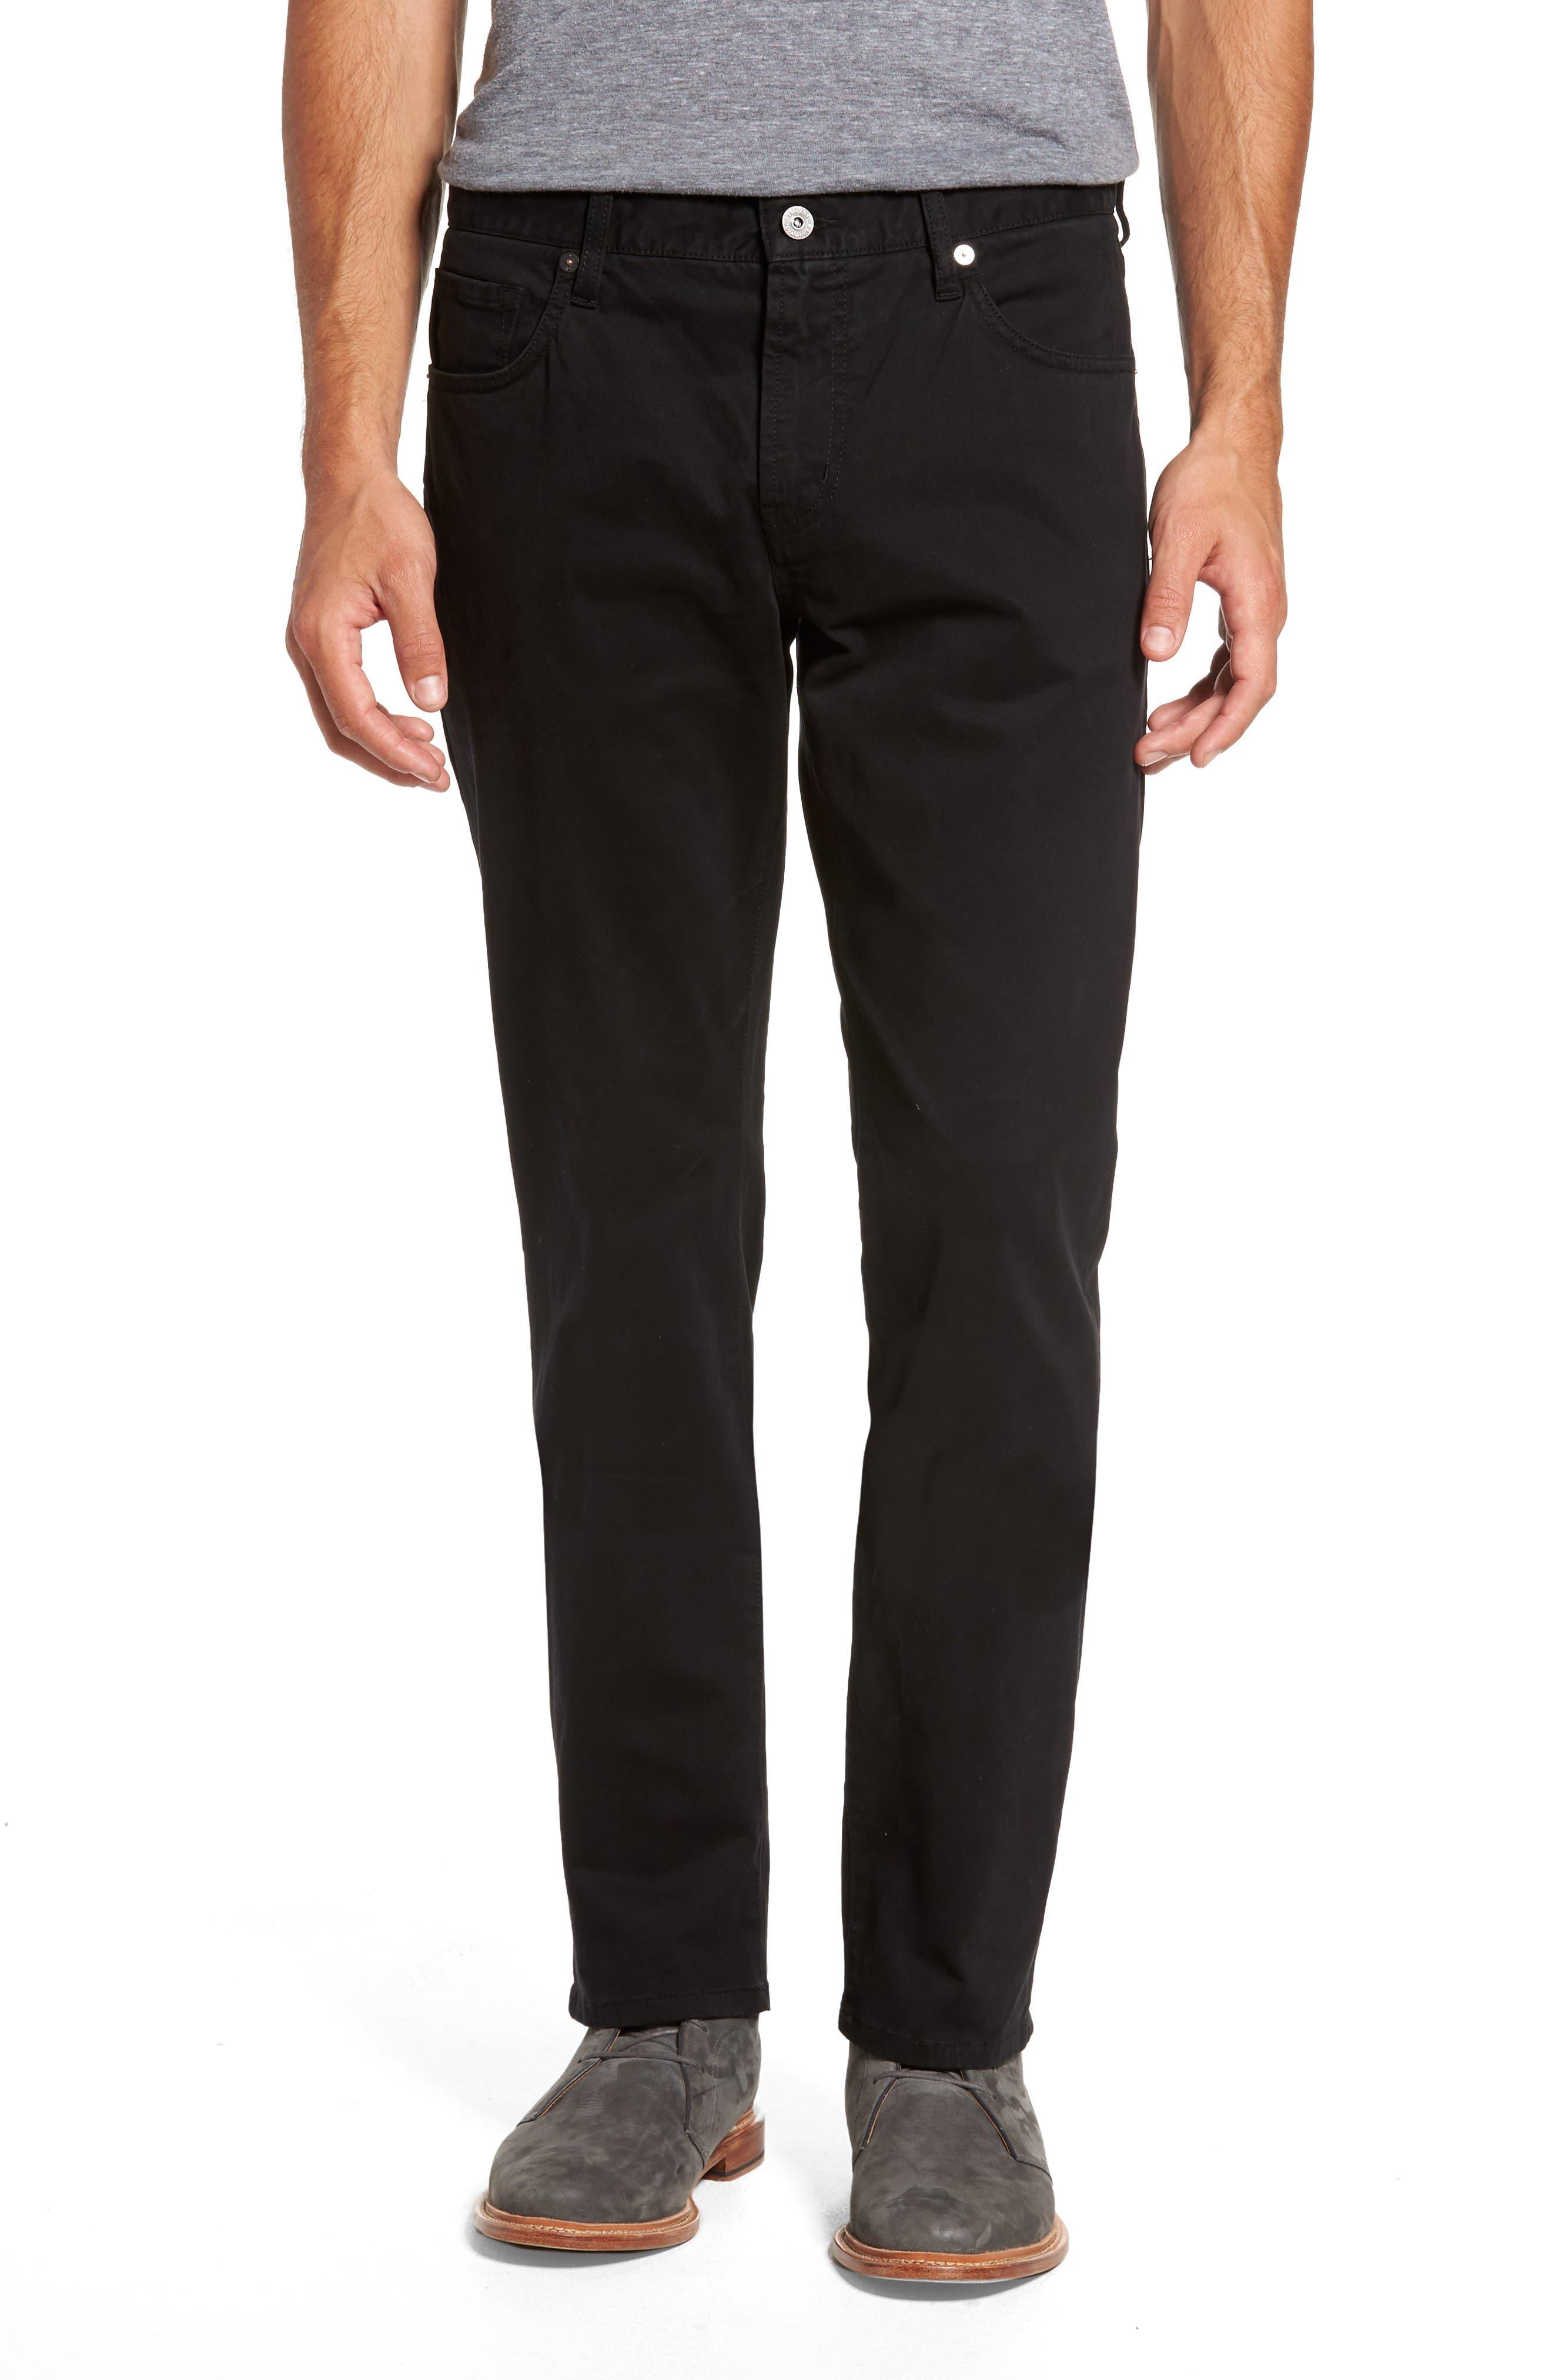 Brushed Twill Five-Pocket Pants,                             Main thumbnail 1, color,                             BLACK